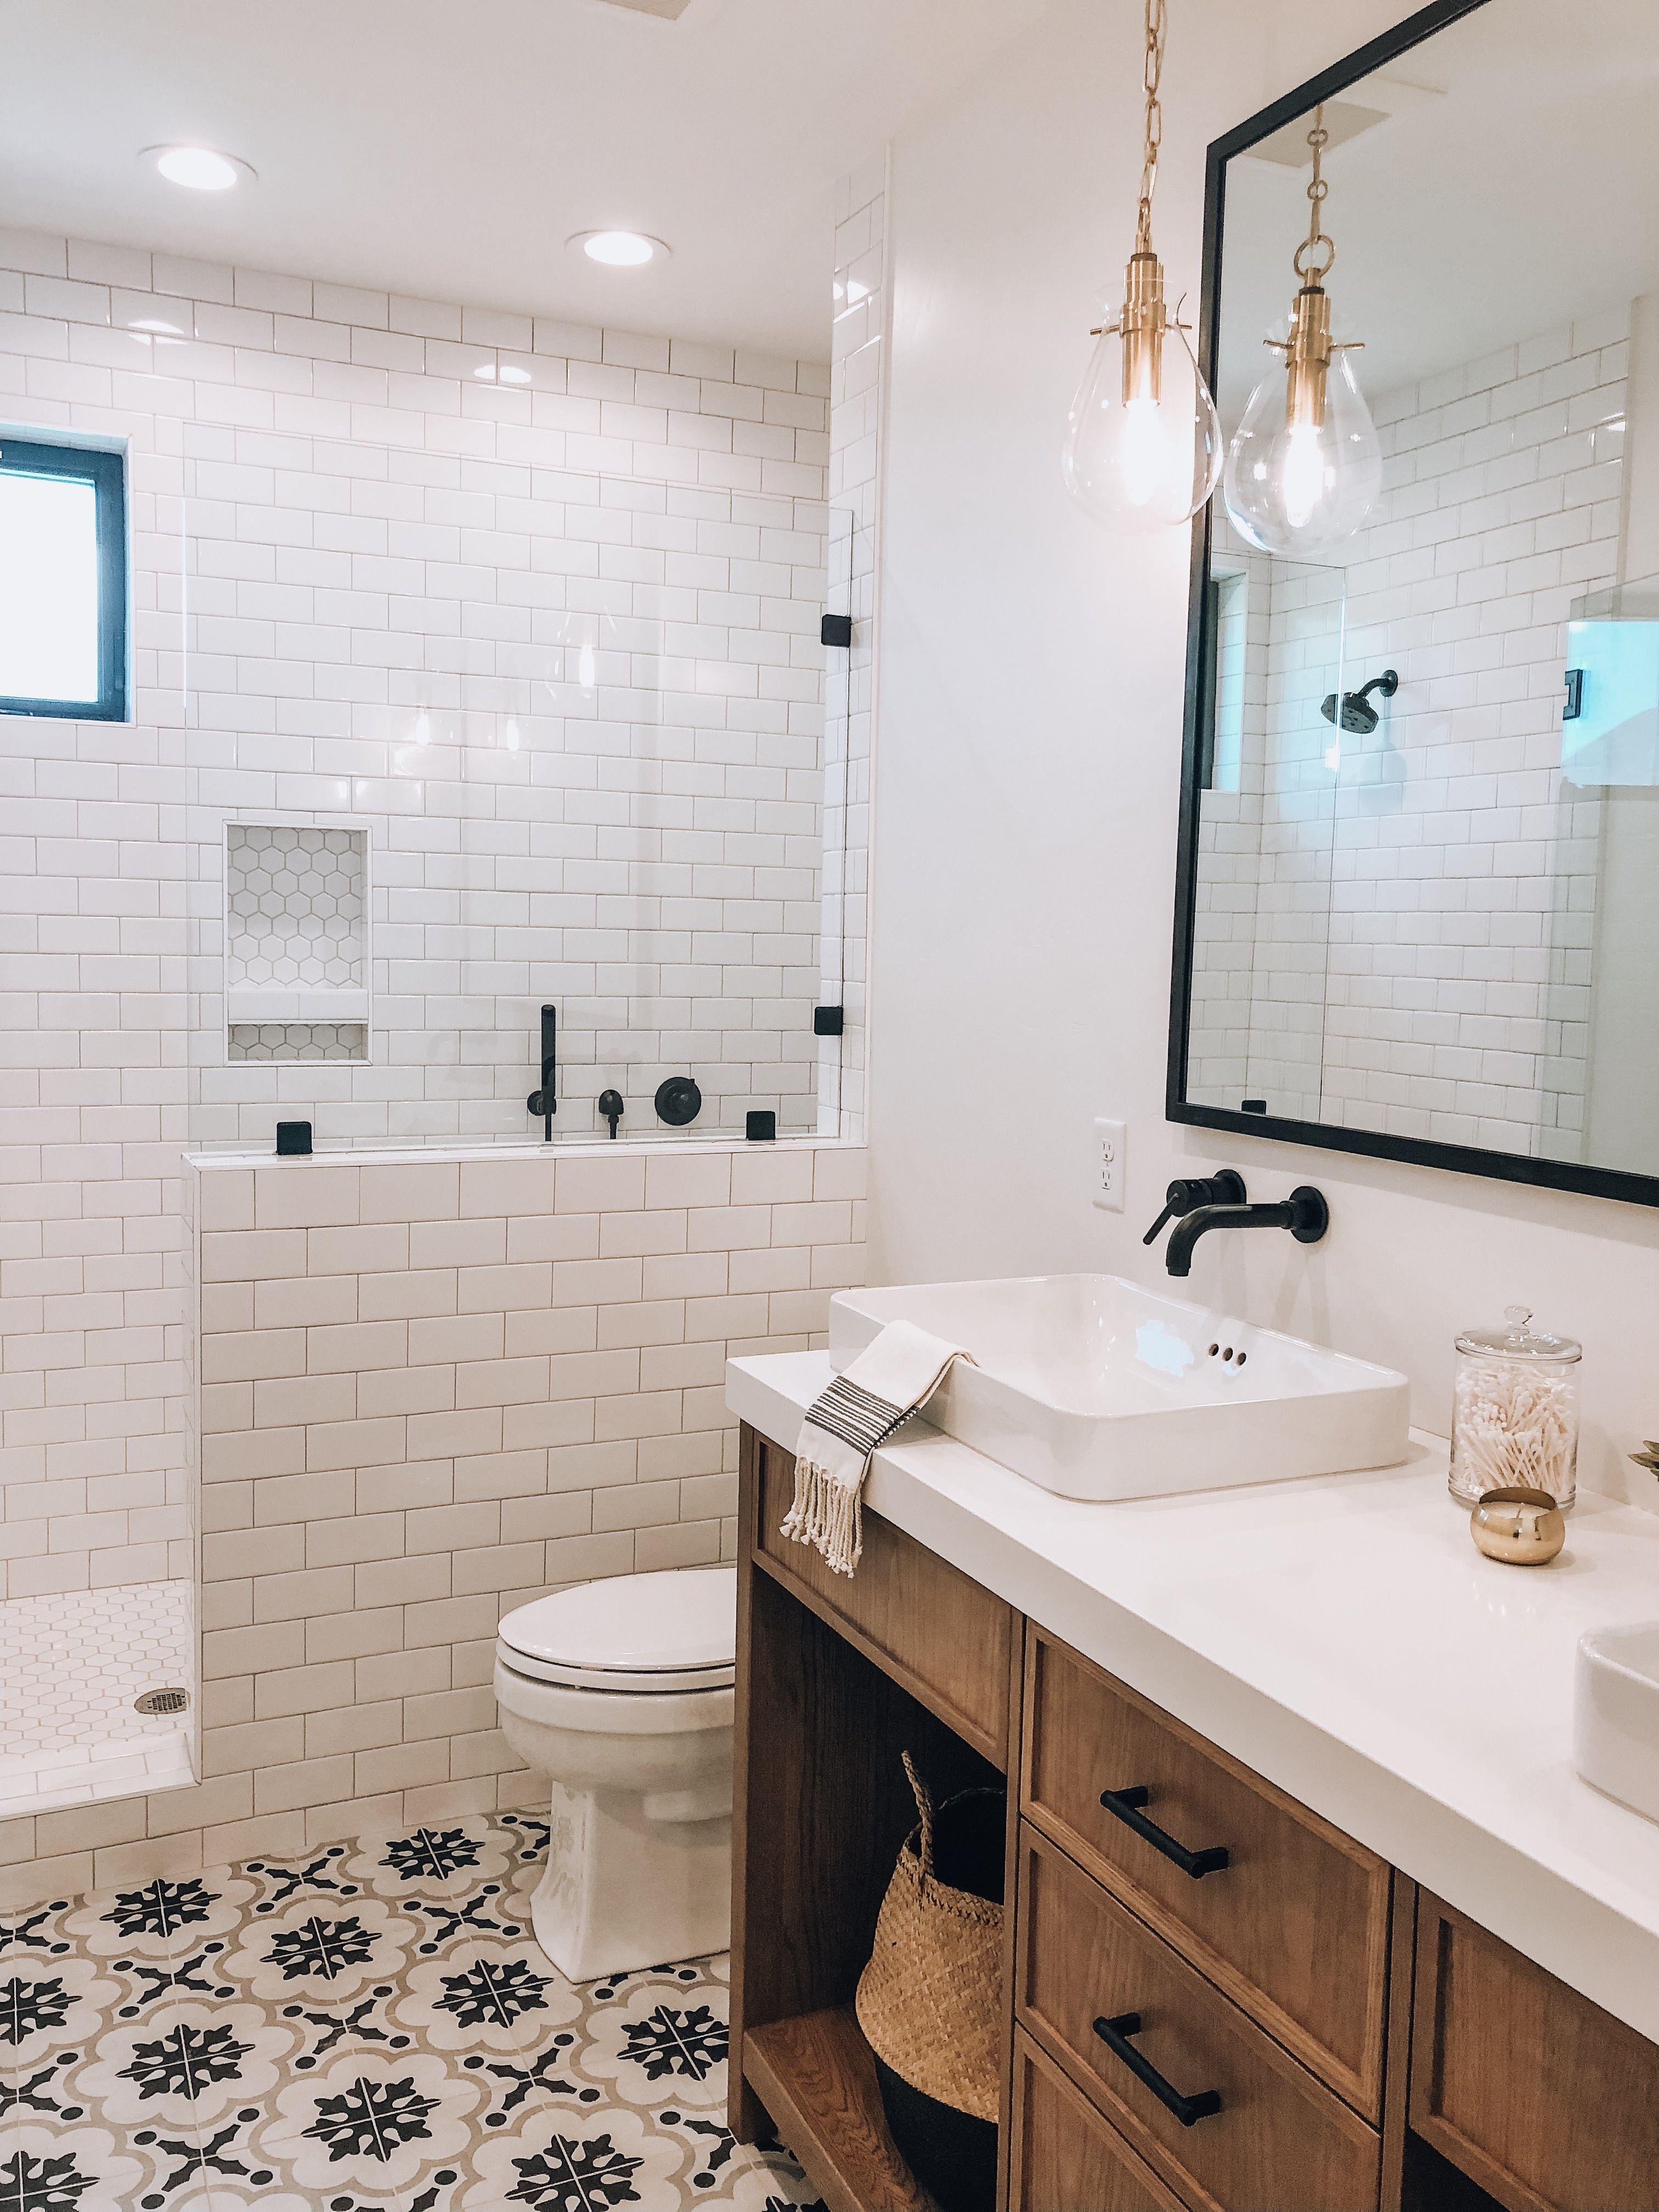 Best Of Uvparade Summit Creek Home 4 Guest Bathroom Guest Bathroom Home Parade Of Homes Tiny home interior guest bathroom